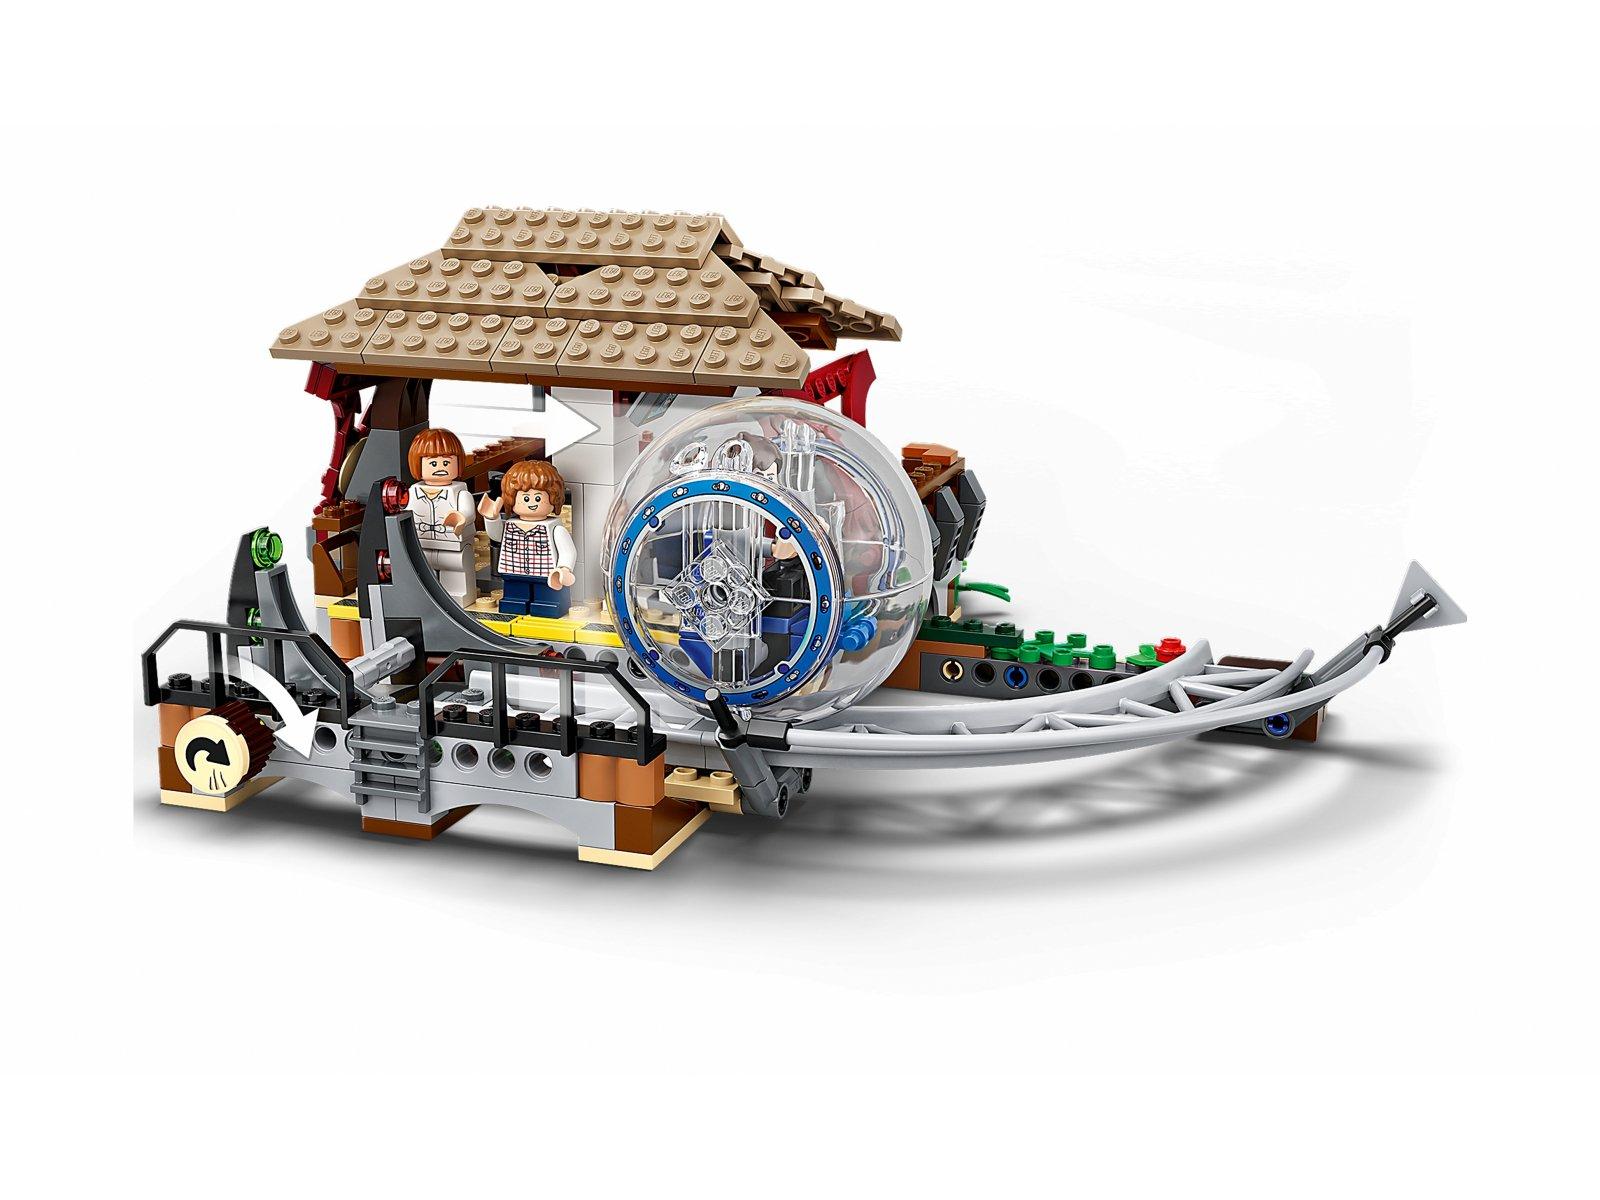 LEGO 75941 Jurassic World Indominus Rex kontra ankylozaur